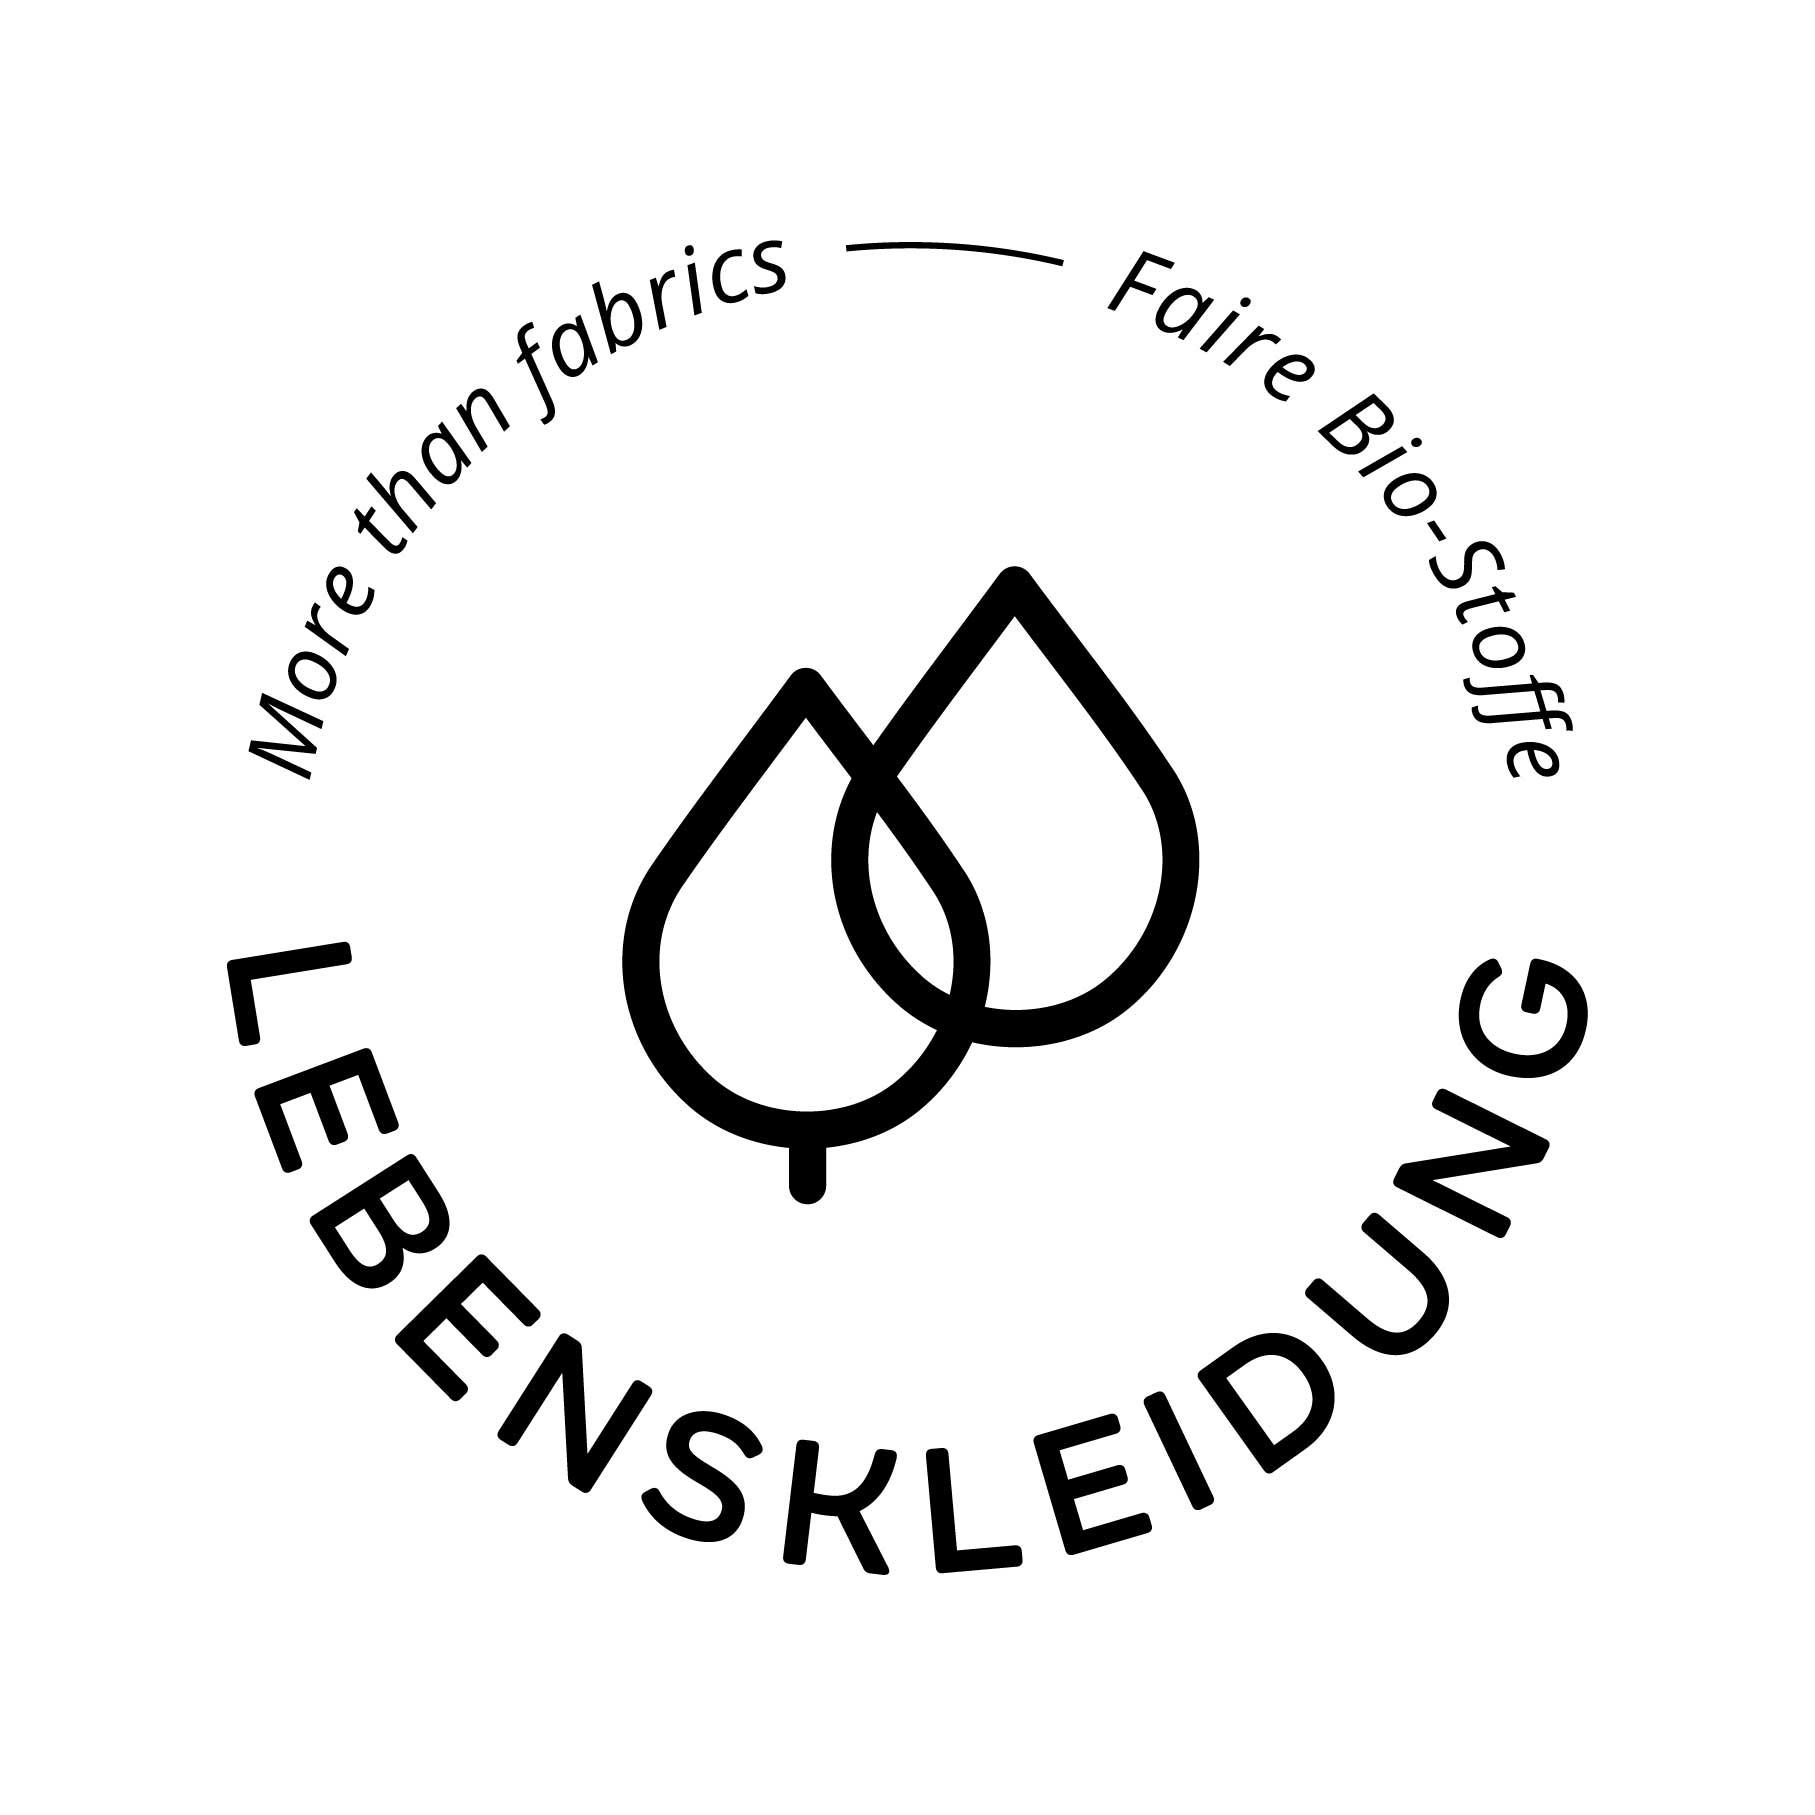 Bio Tessuto di Jersey elastico - Bianco senza sbiancantes otticos